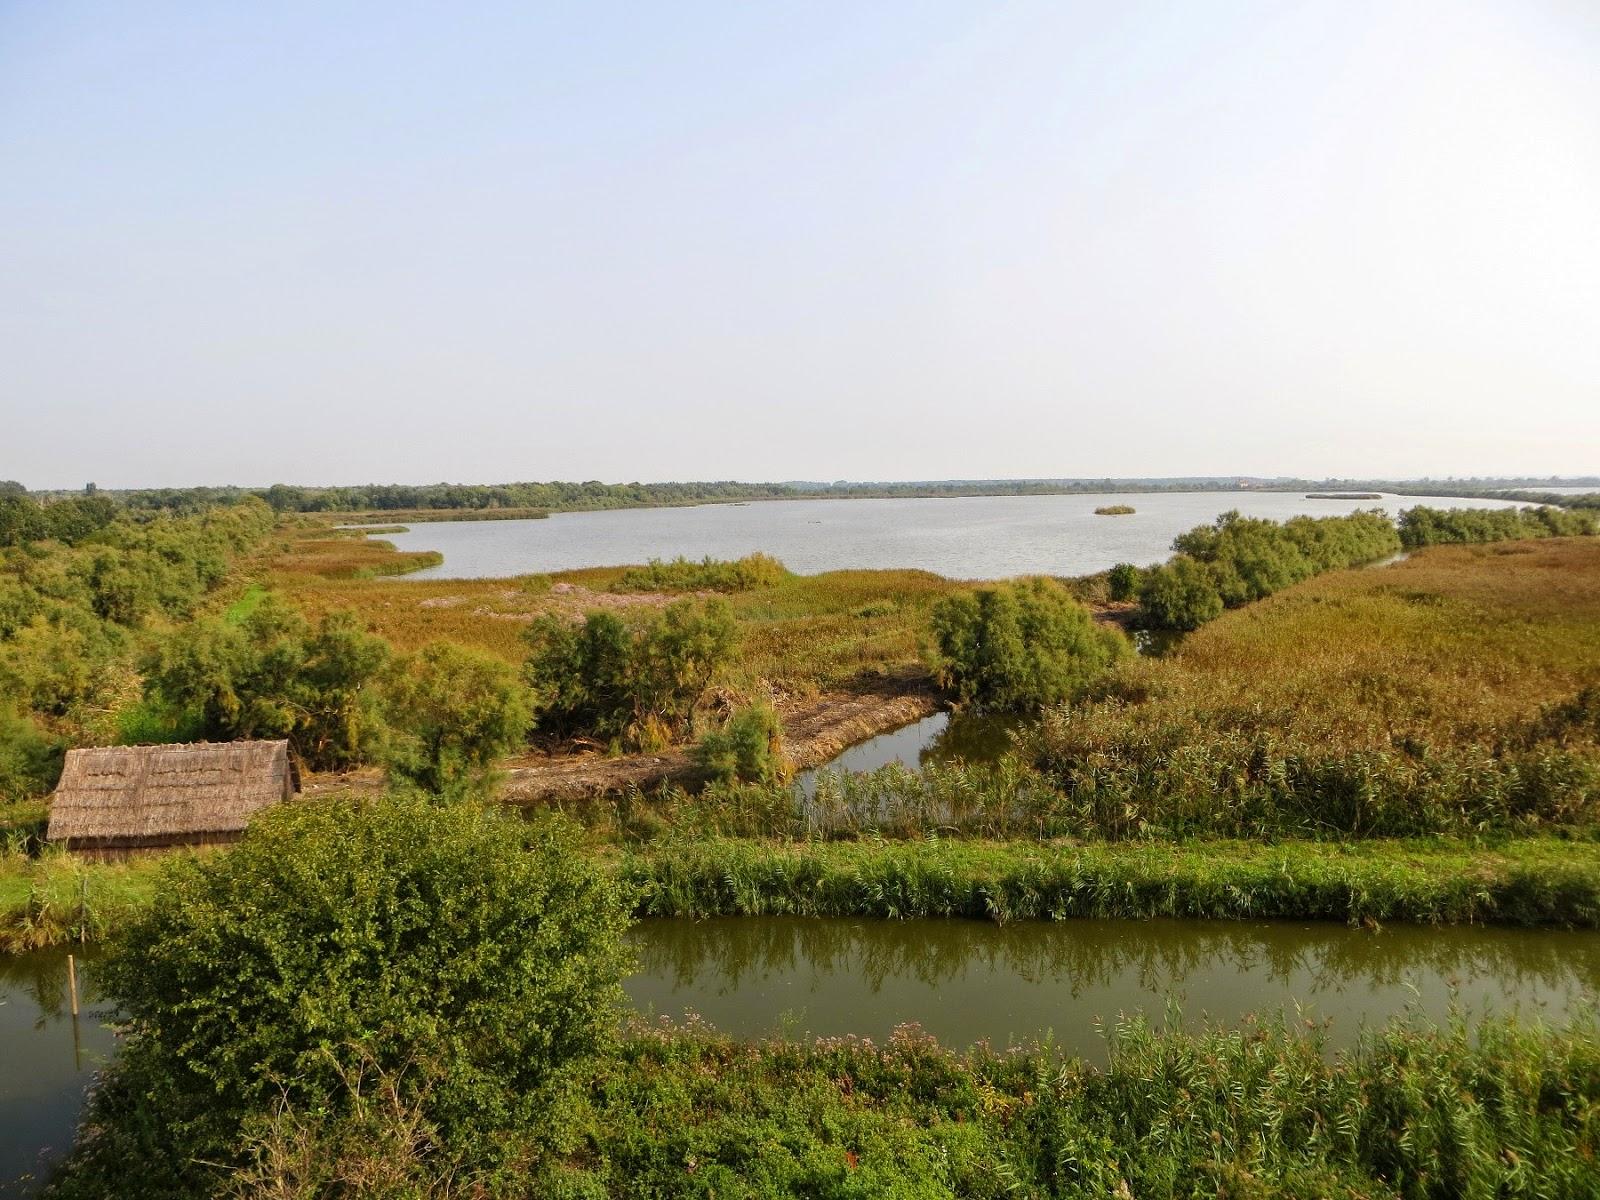 oasi wwf valle averto laguna di venezia